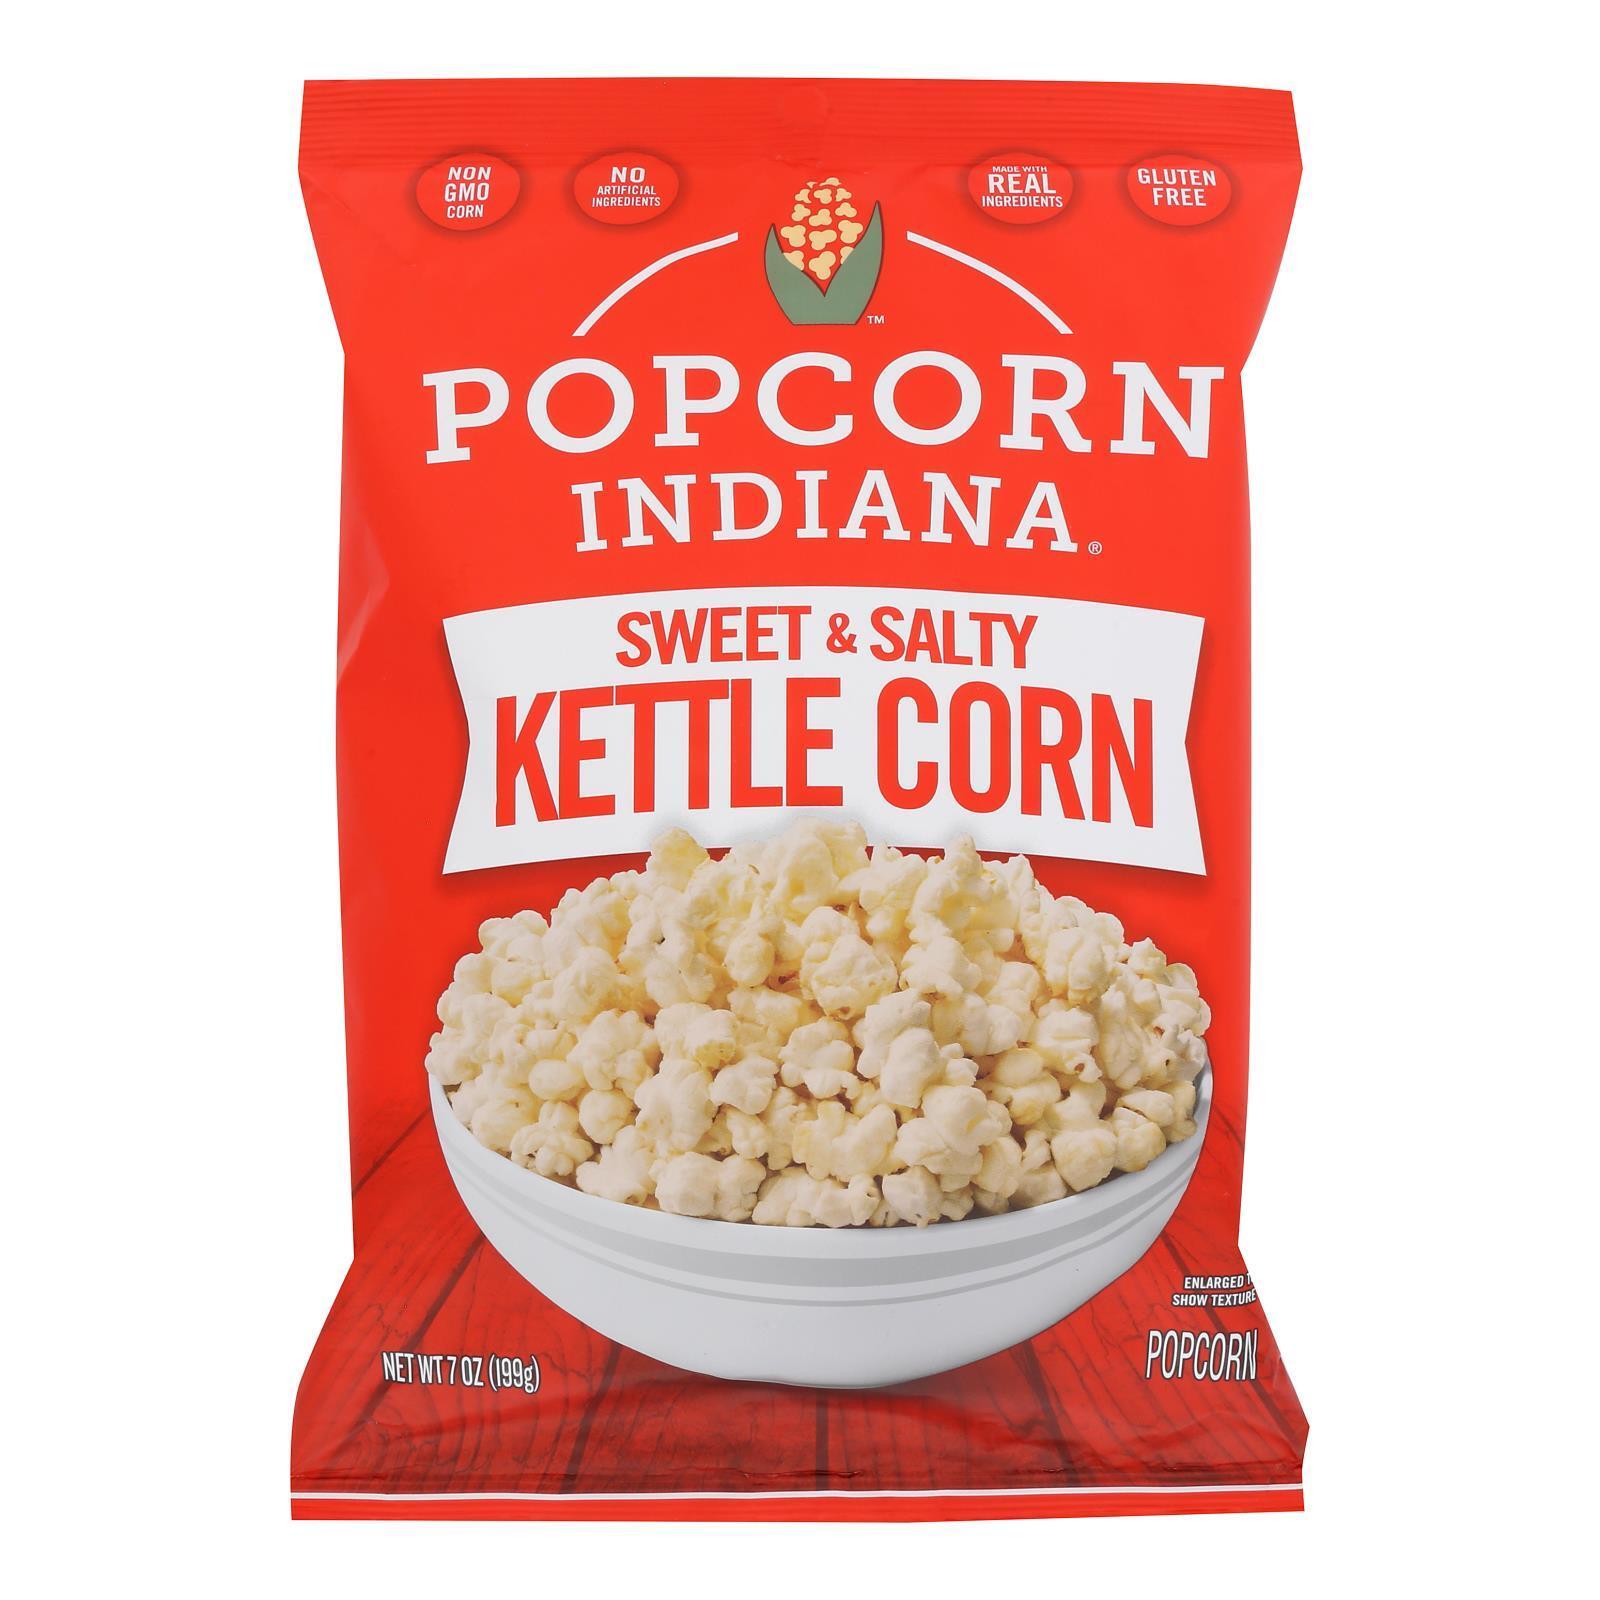 Popcorn Indiana Popcorn - Original Kettlecorn - Case of 12 - 7 oz.